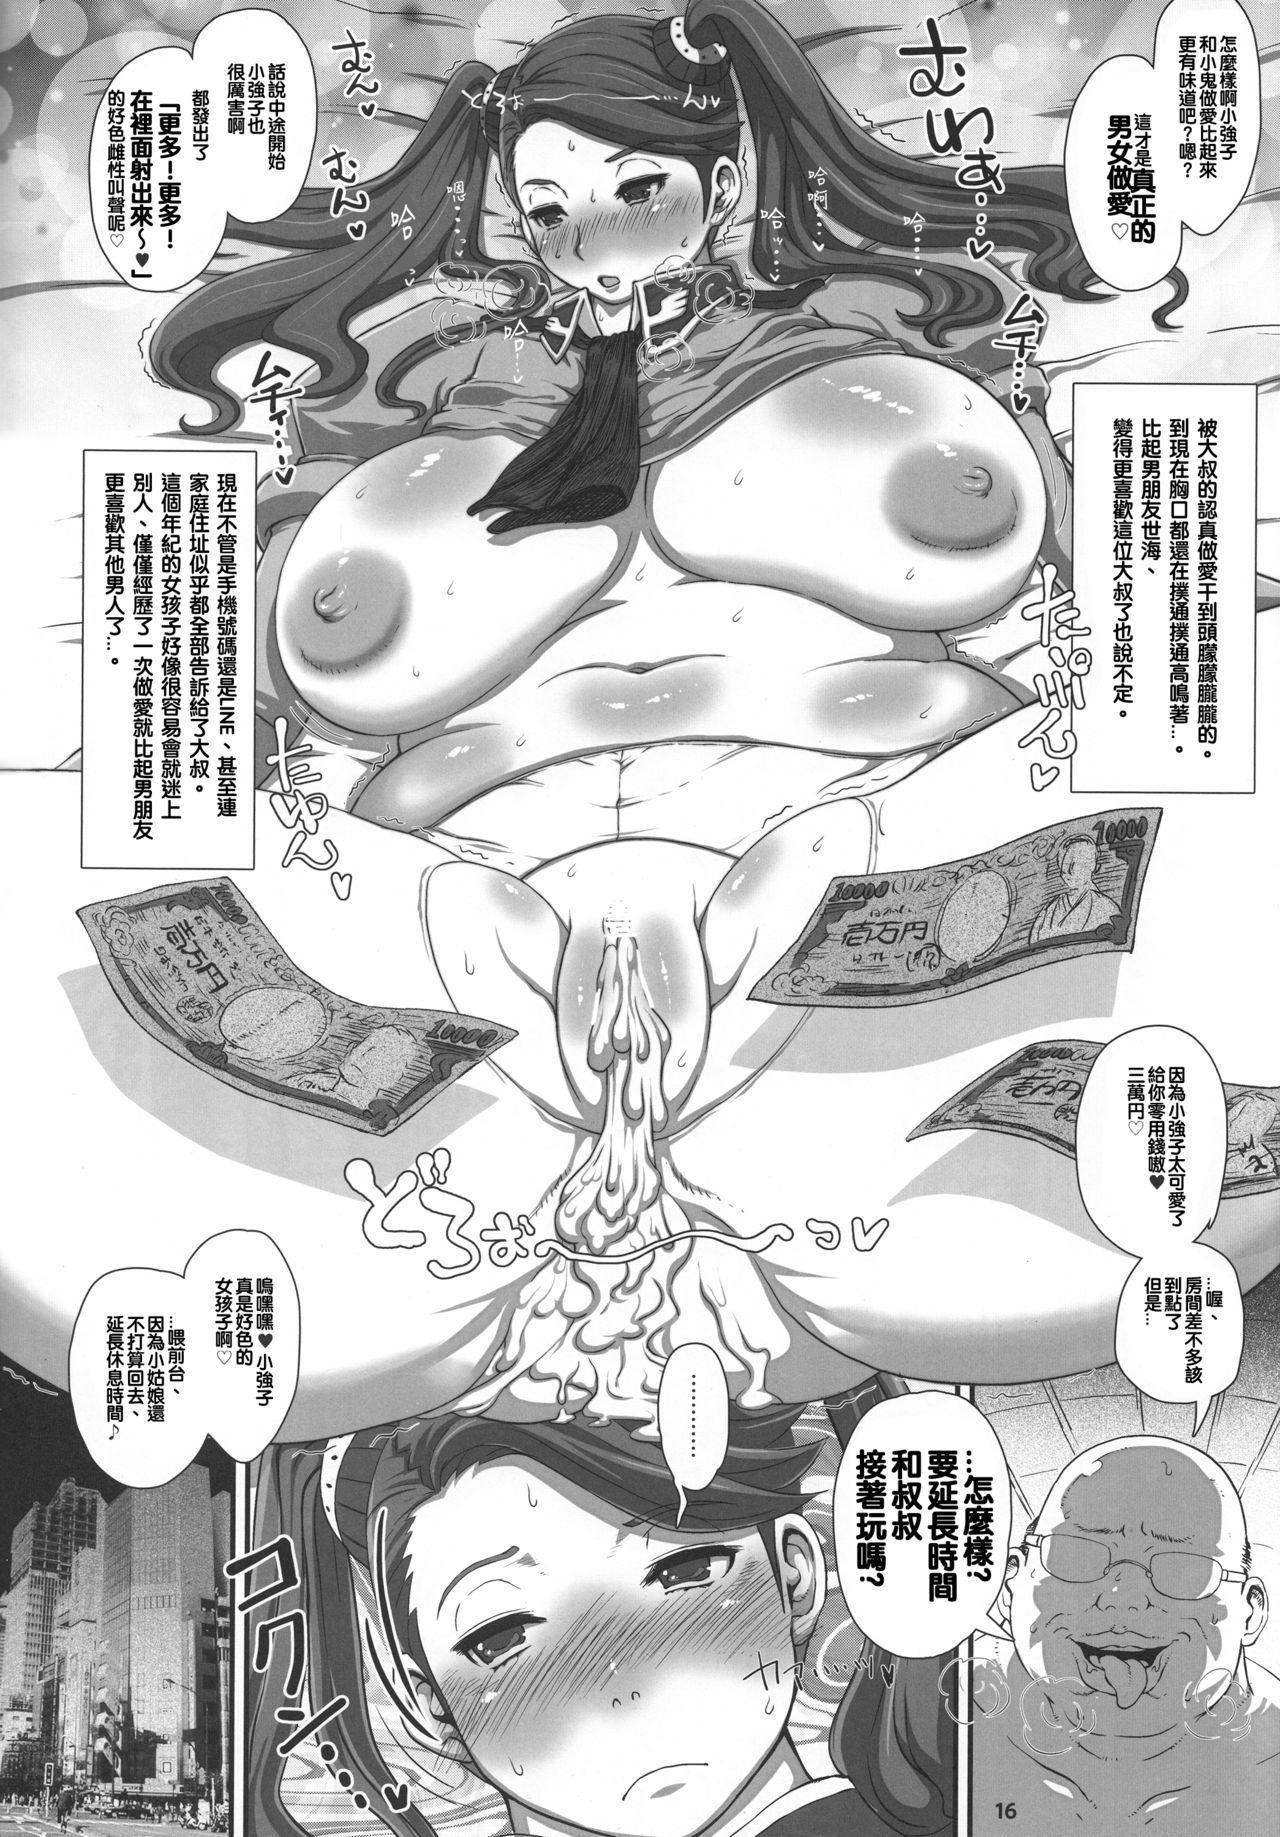 METABOLISM G Hatsujou Gyanko no Nikushoku Fudeoroshi + NTR | 肥滿主義G 發情強子的肉食開苞+NTR 15